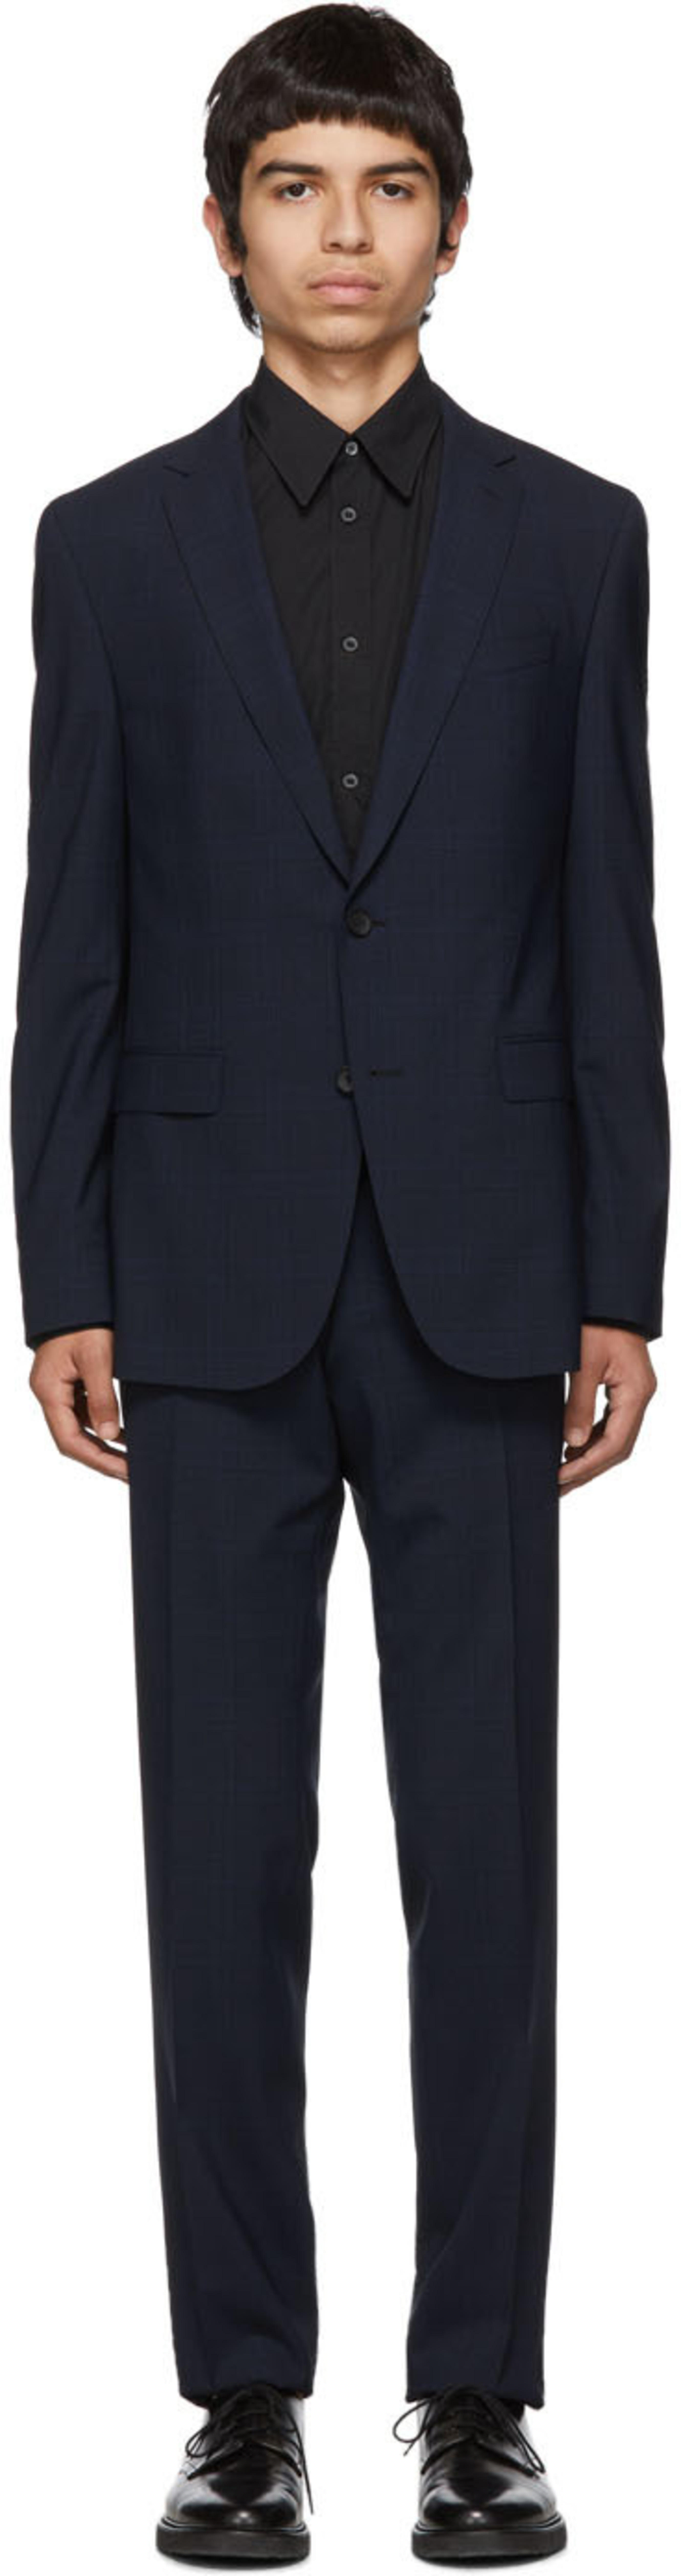 6c12d4cd8 Boss for Men SS19 Collection | SSENSE Canada